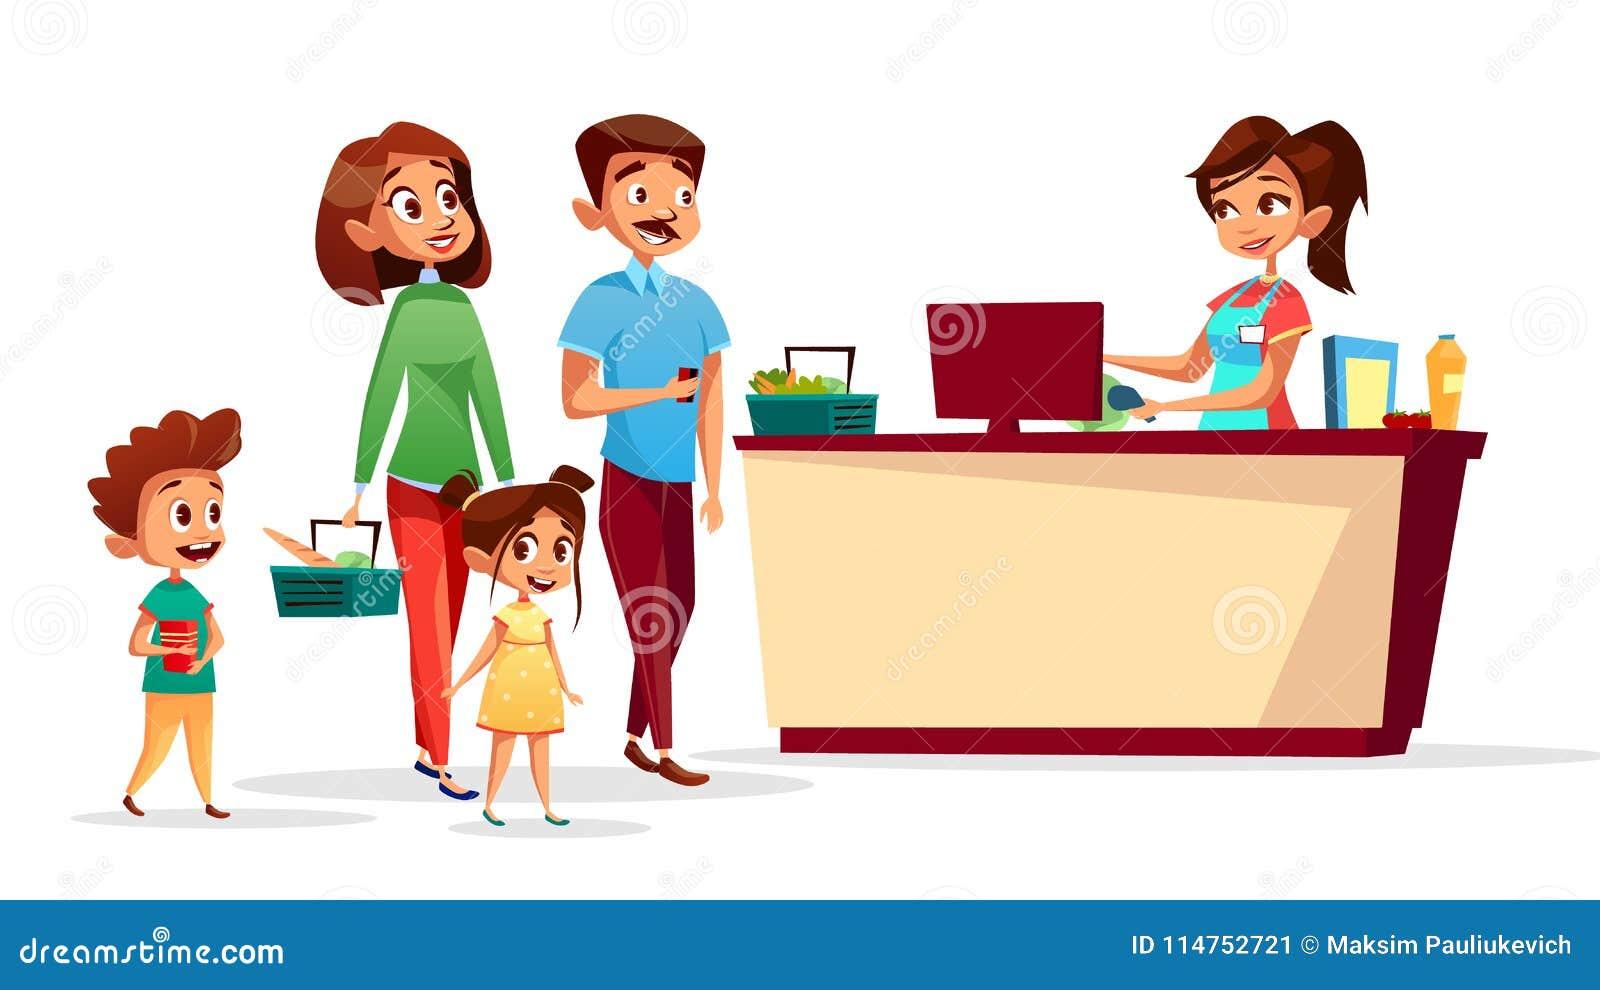 Cashier Cartoons: People At Supermarket Checkout Counter Vector Cartoon